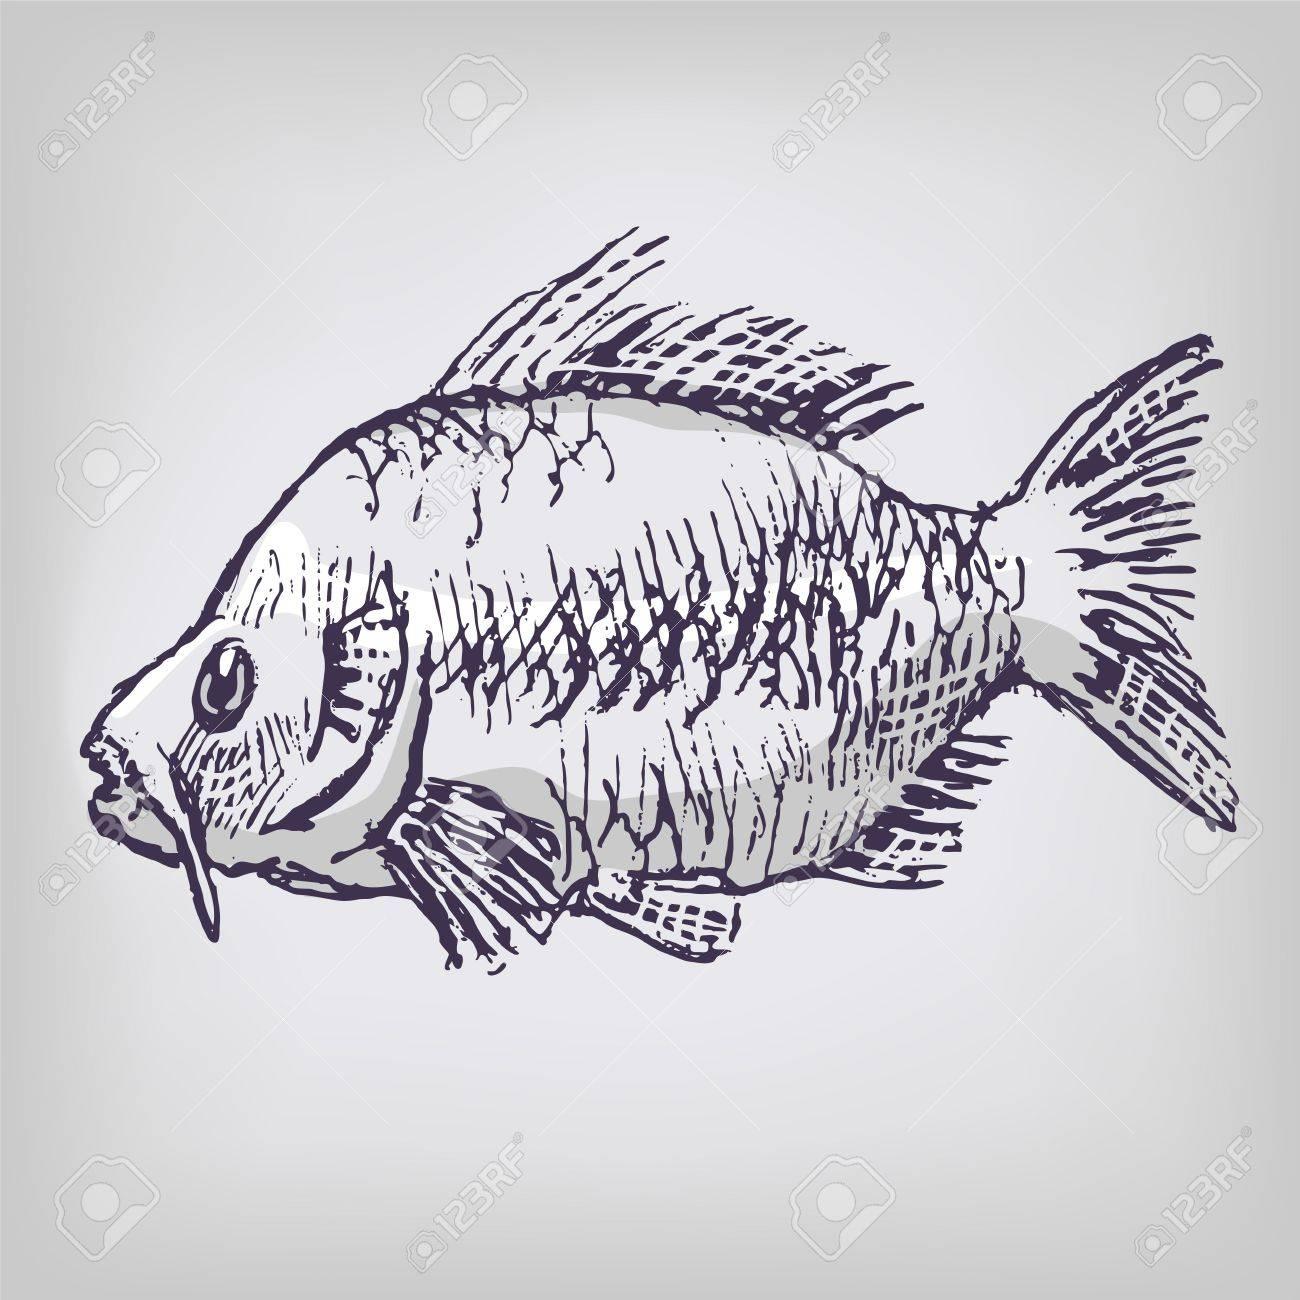 Carp and fishing Stock Vector - 18098918